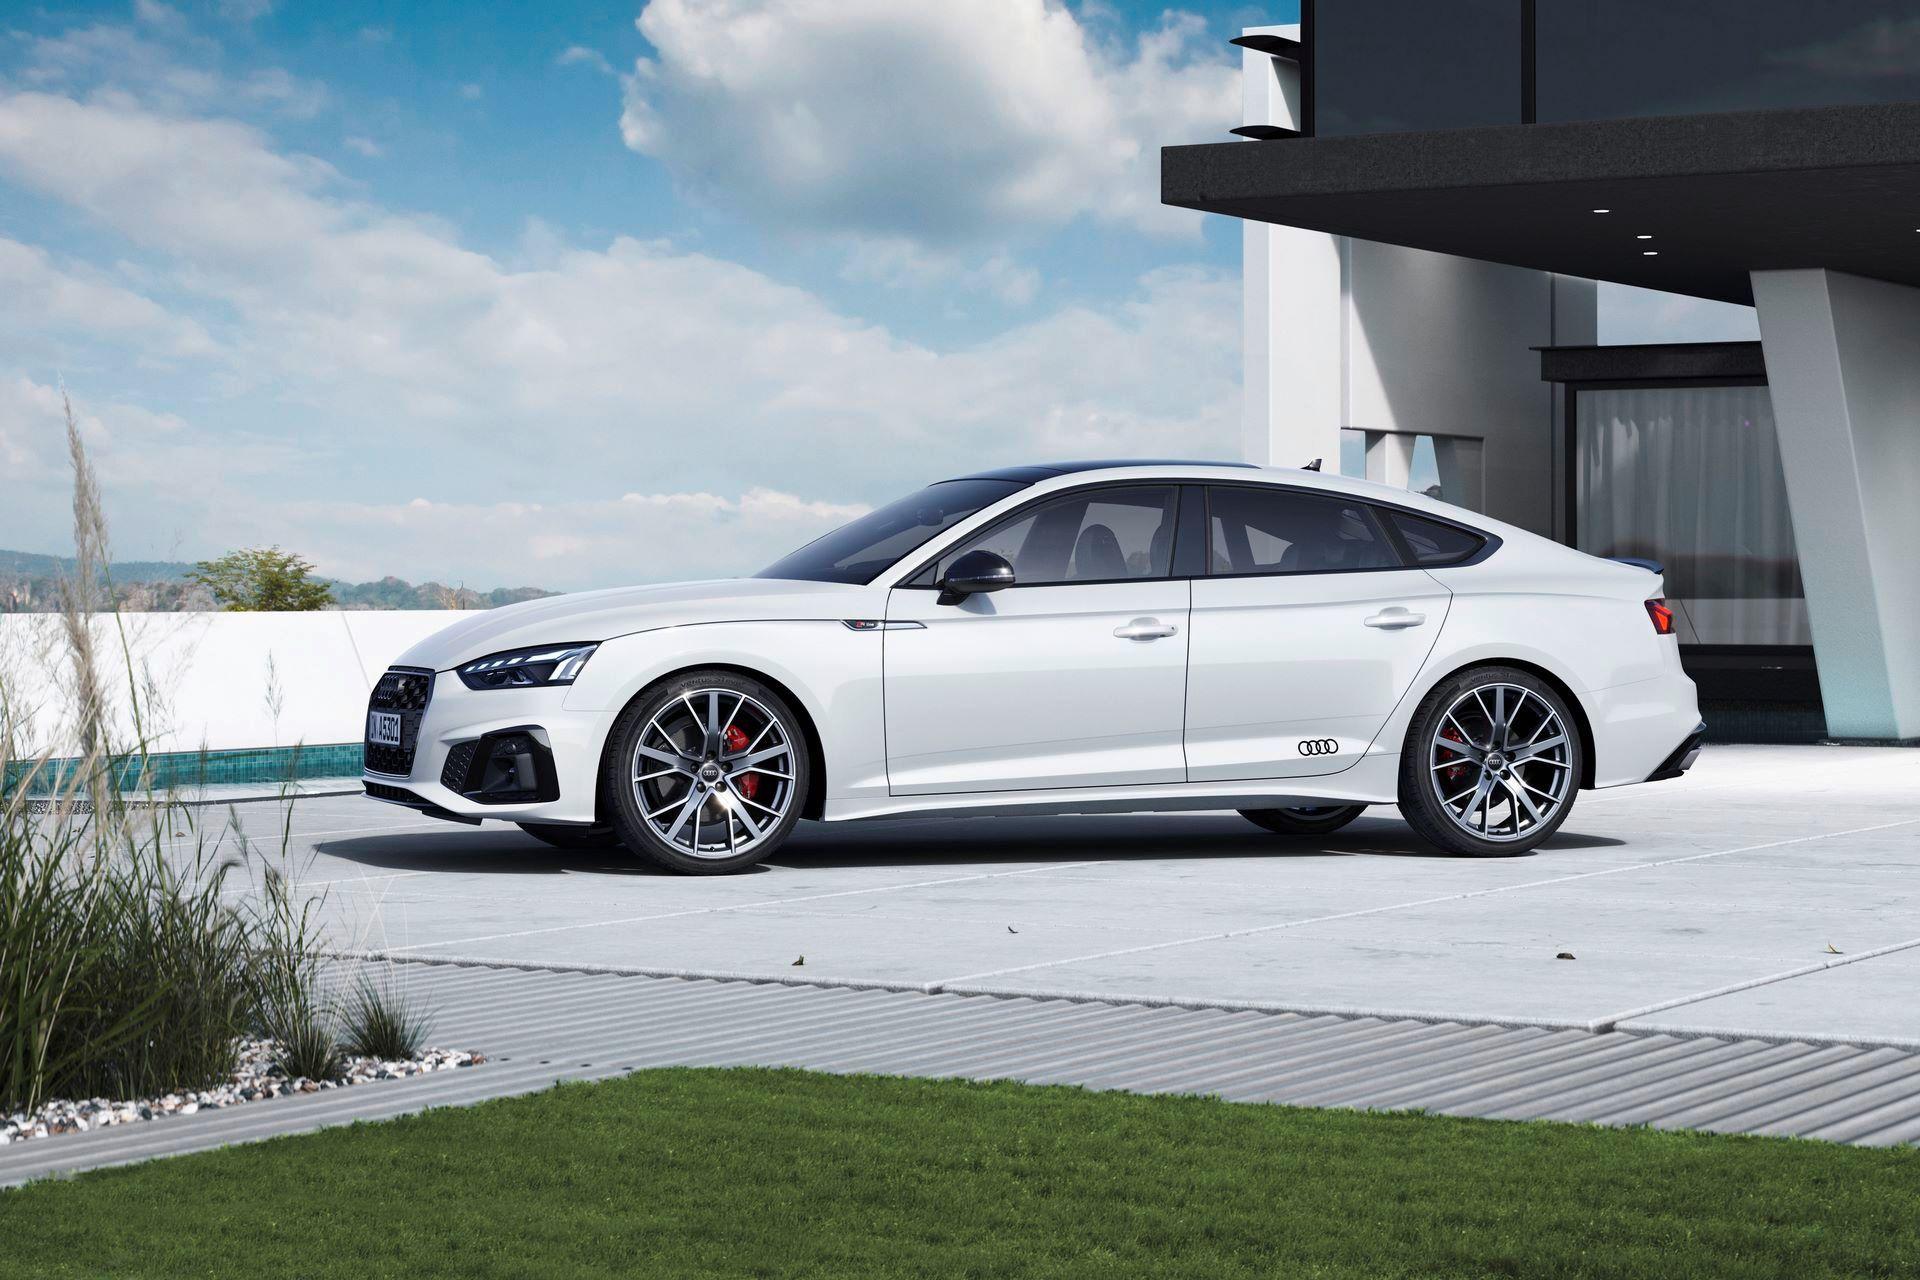 Audi-A4-A5-Q7-Q8-Competition-And-Competition-Plus-Trims-67